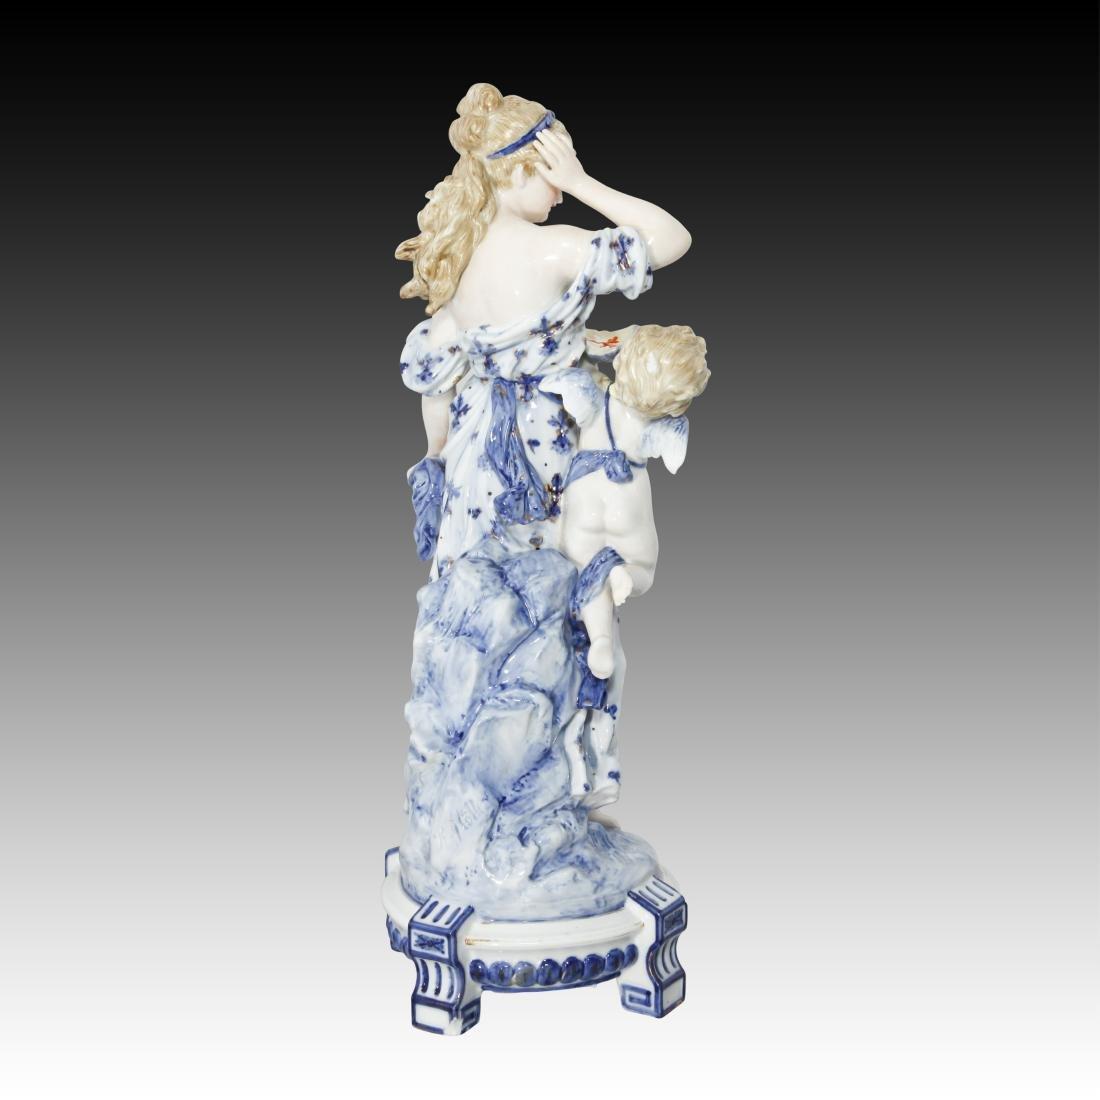 KPM Rubenesque Woman with Cherub Figurine 1049 - 3